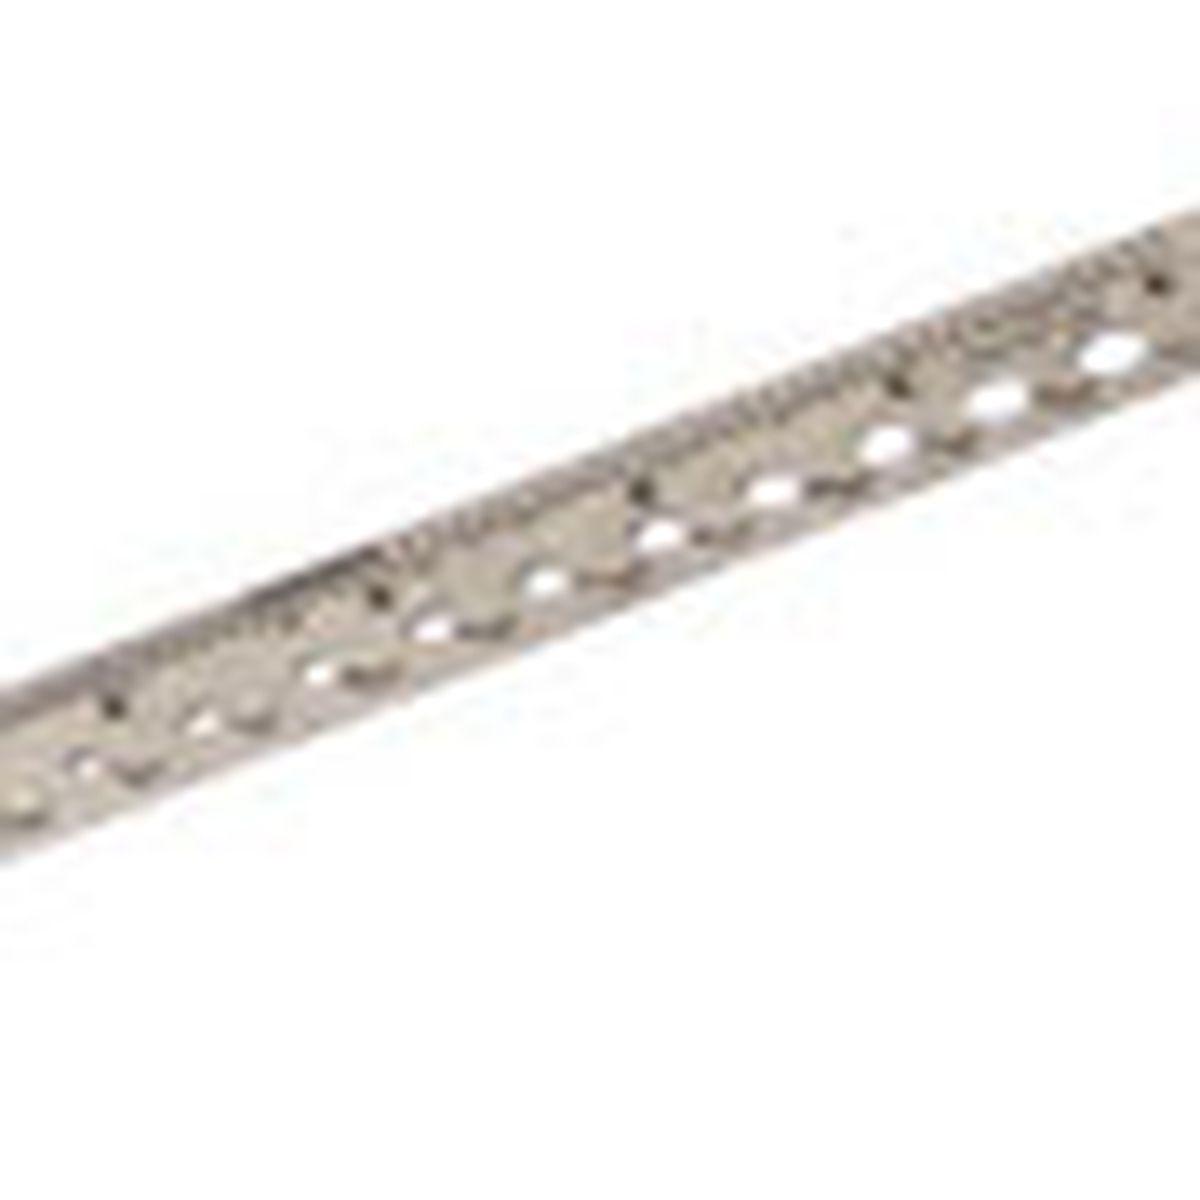 steel-rule straightedge